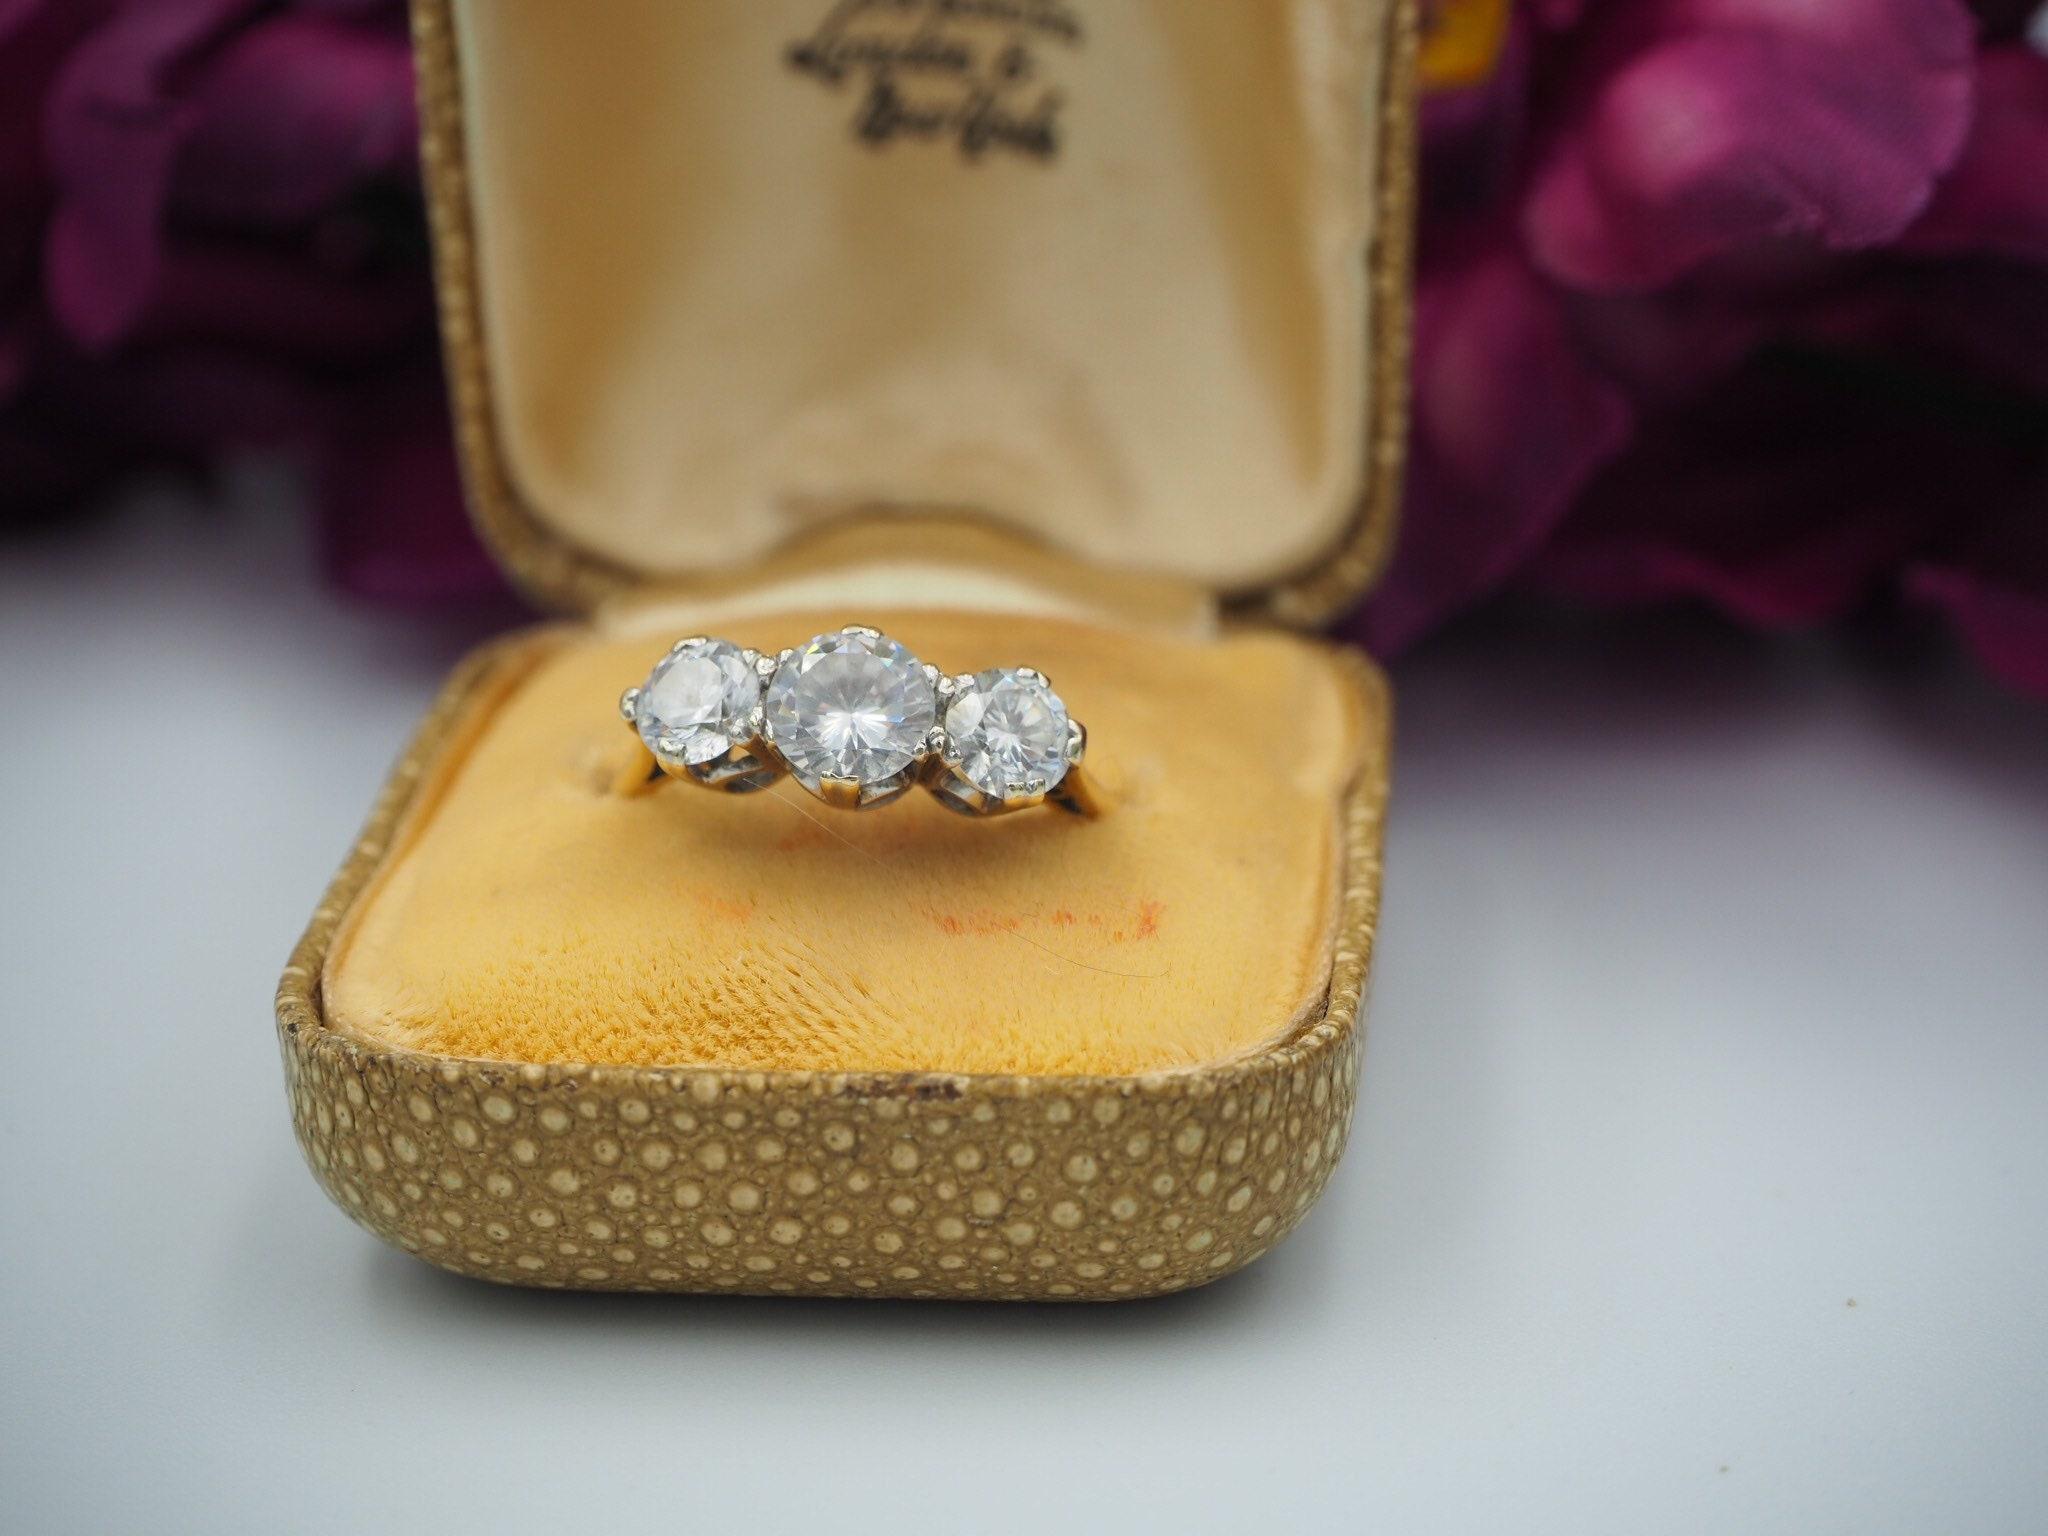 5542de5c6e80e Vintage 9ct Gold Cubic Zirconia Ring With Original Box, Size Q or 8.